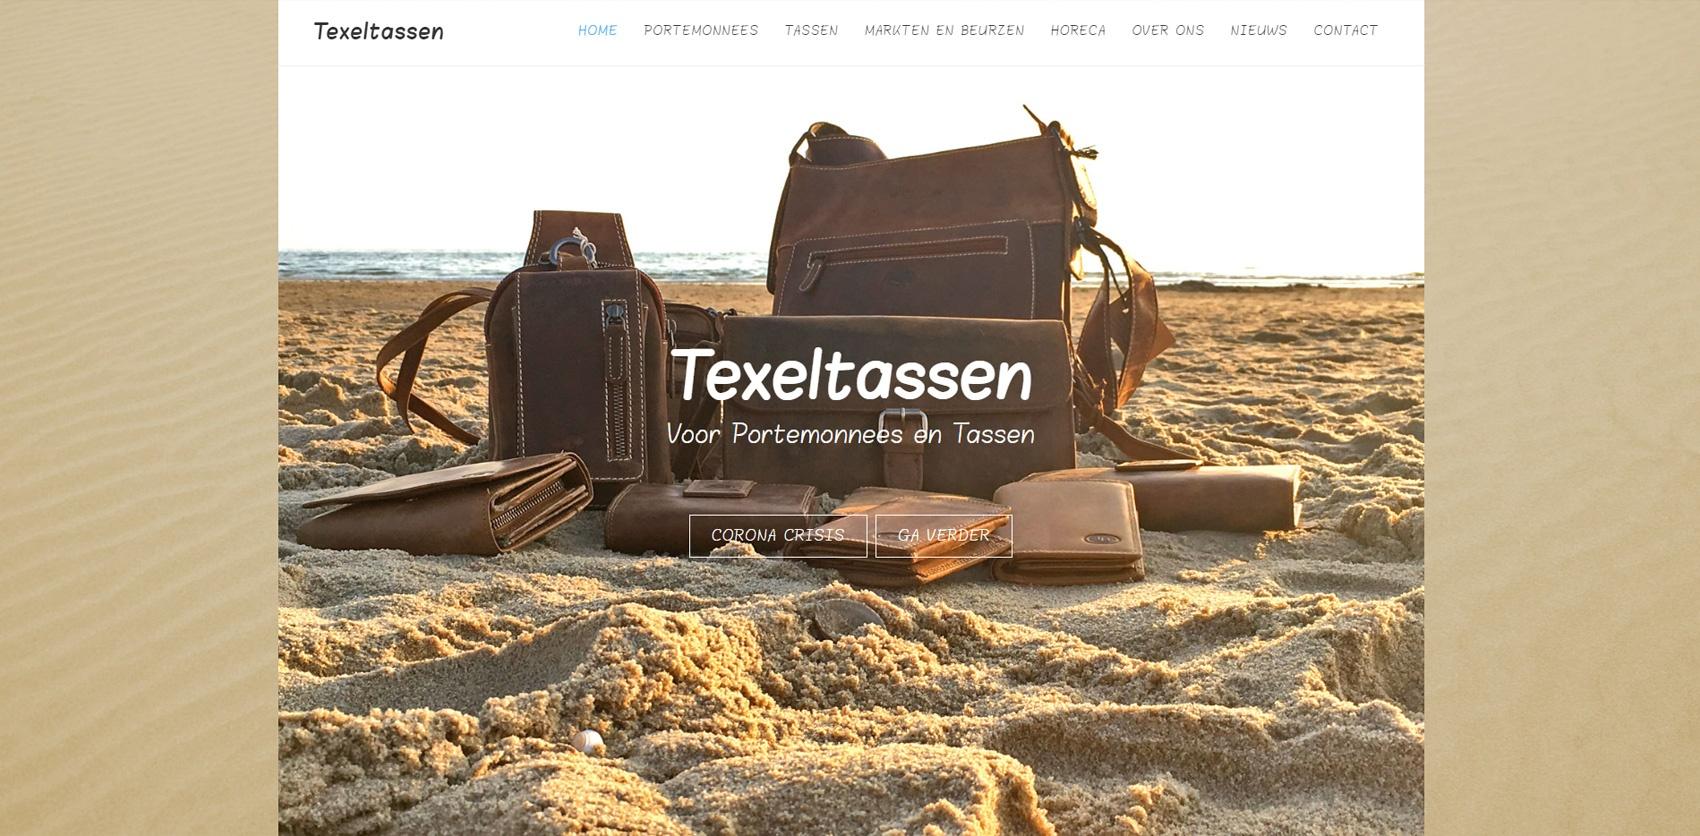 TexelTassen